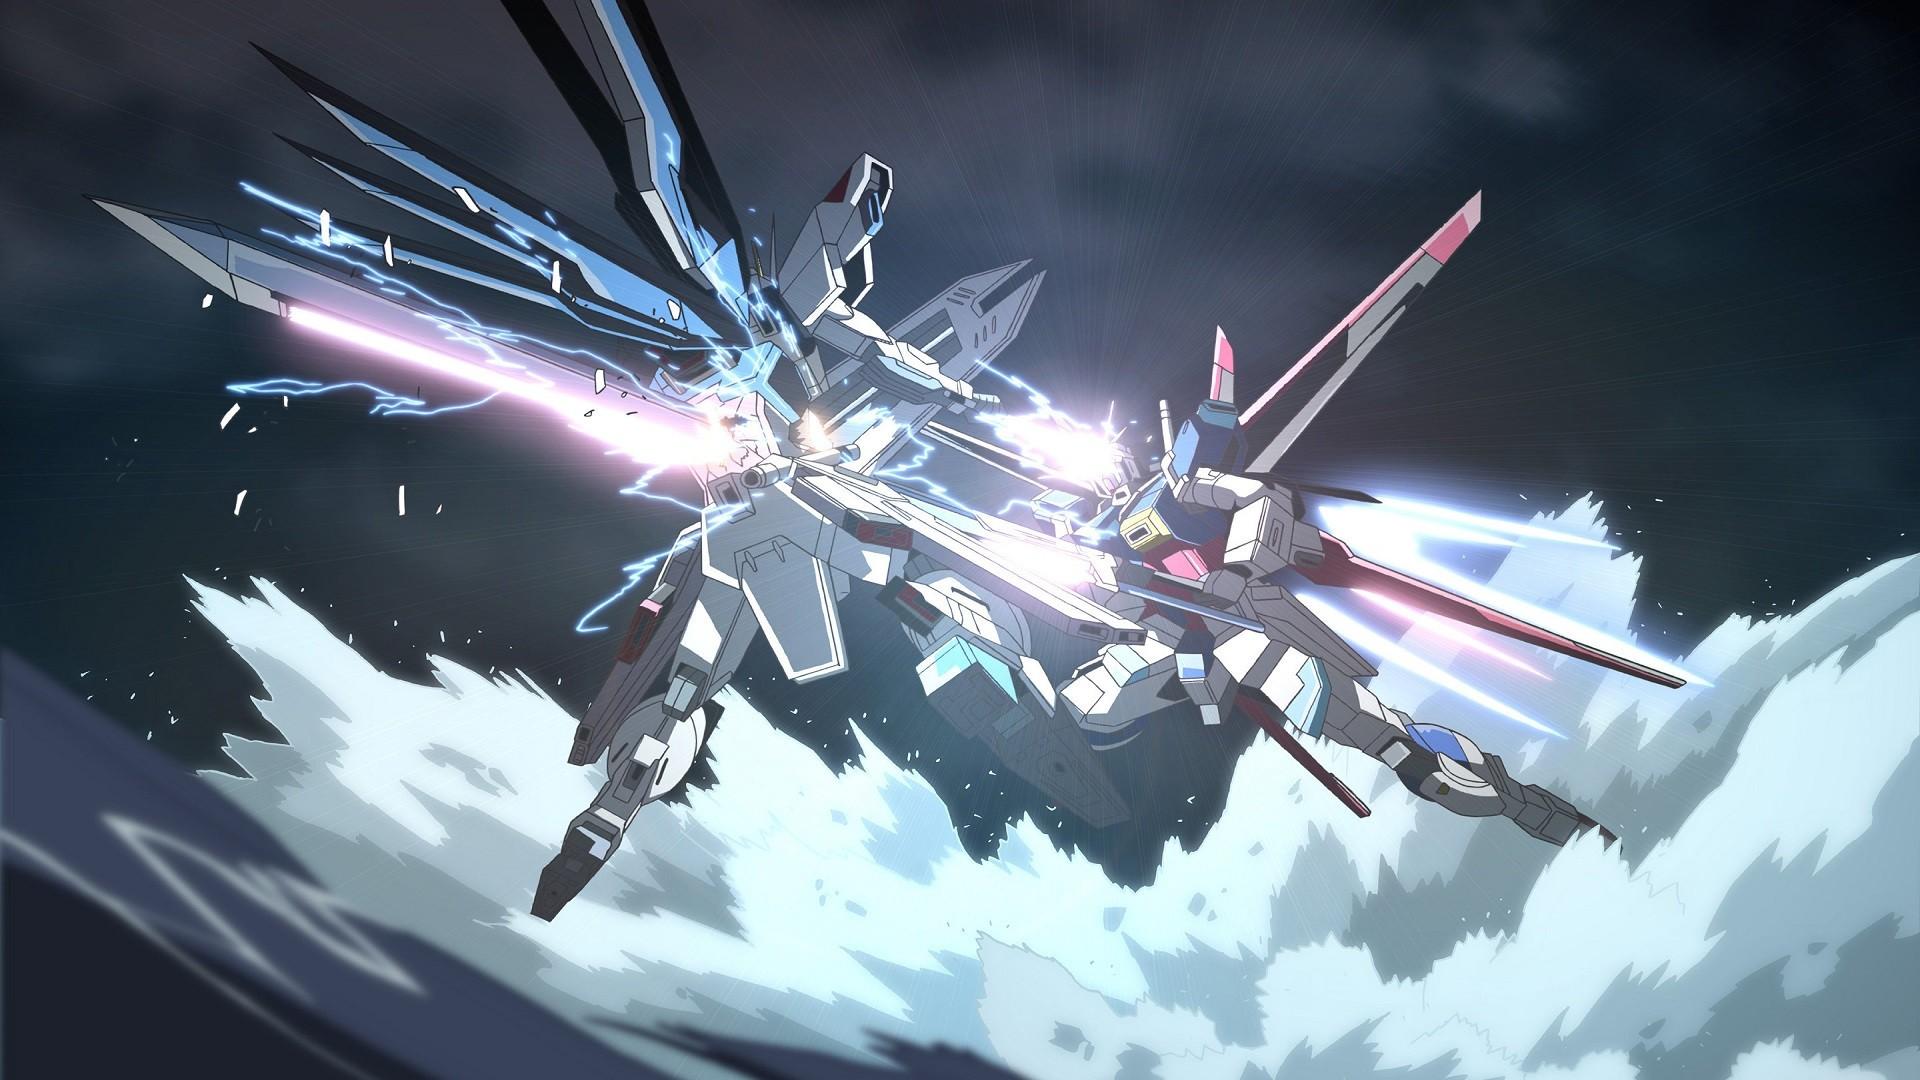 Fondos De Pantalla Anime Mech Mobile Suit Gundam Seed